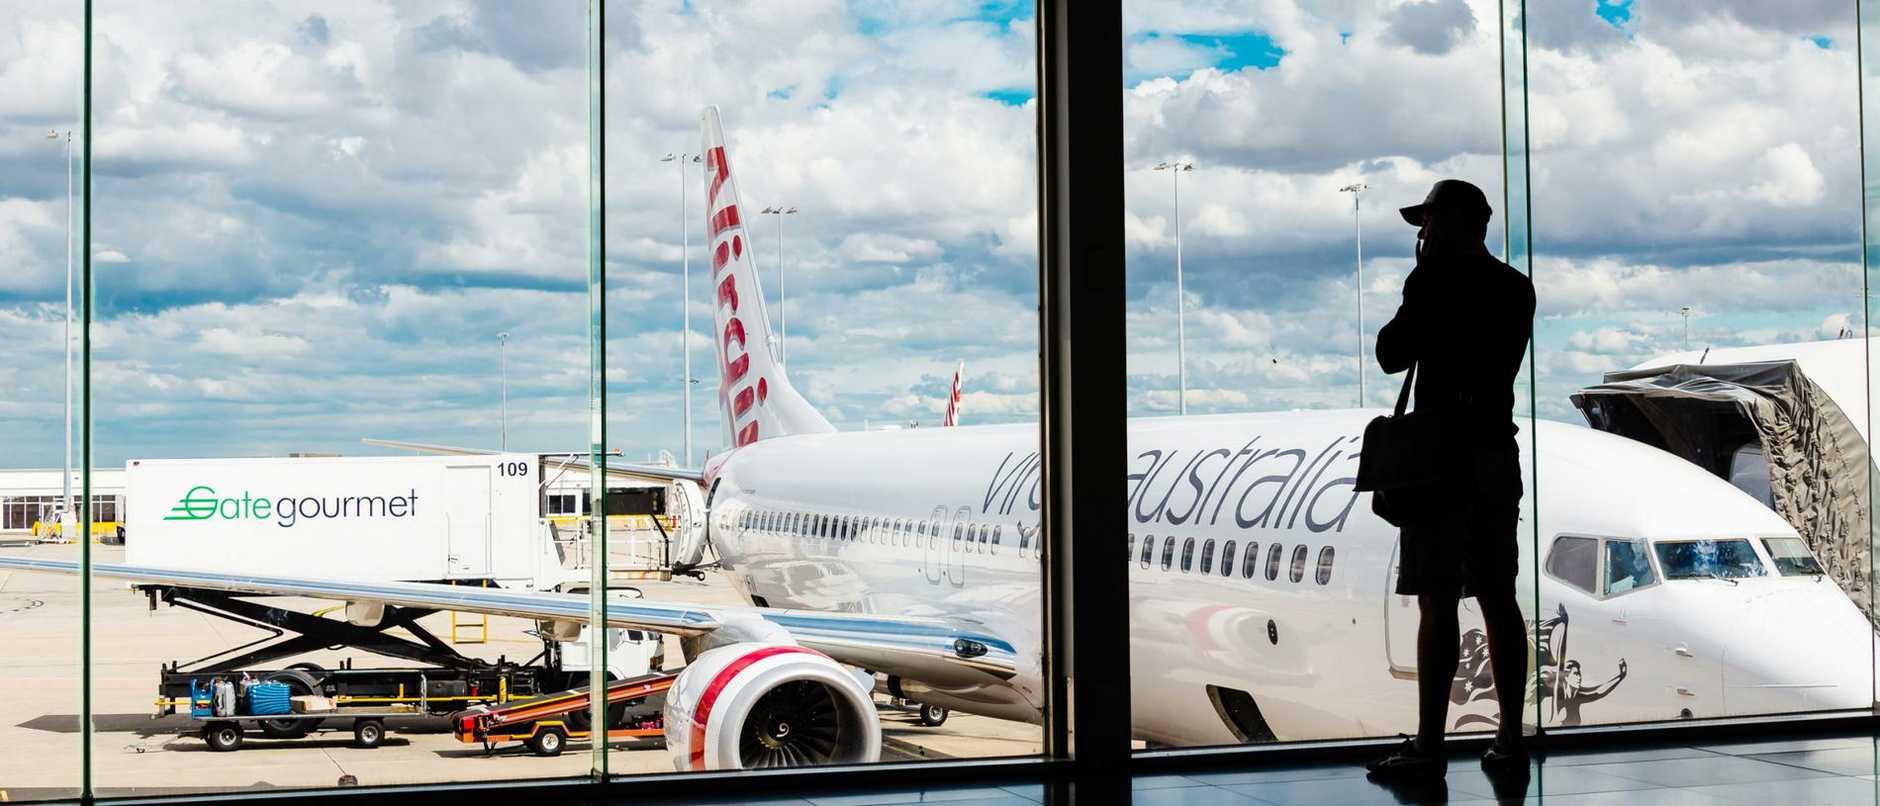 Virgin Australia passenger airliner at Melbourne Airport